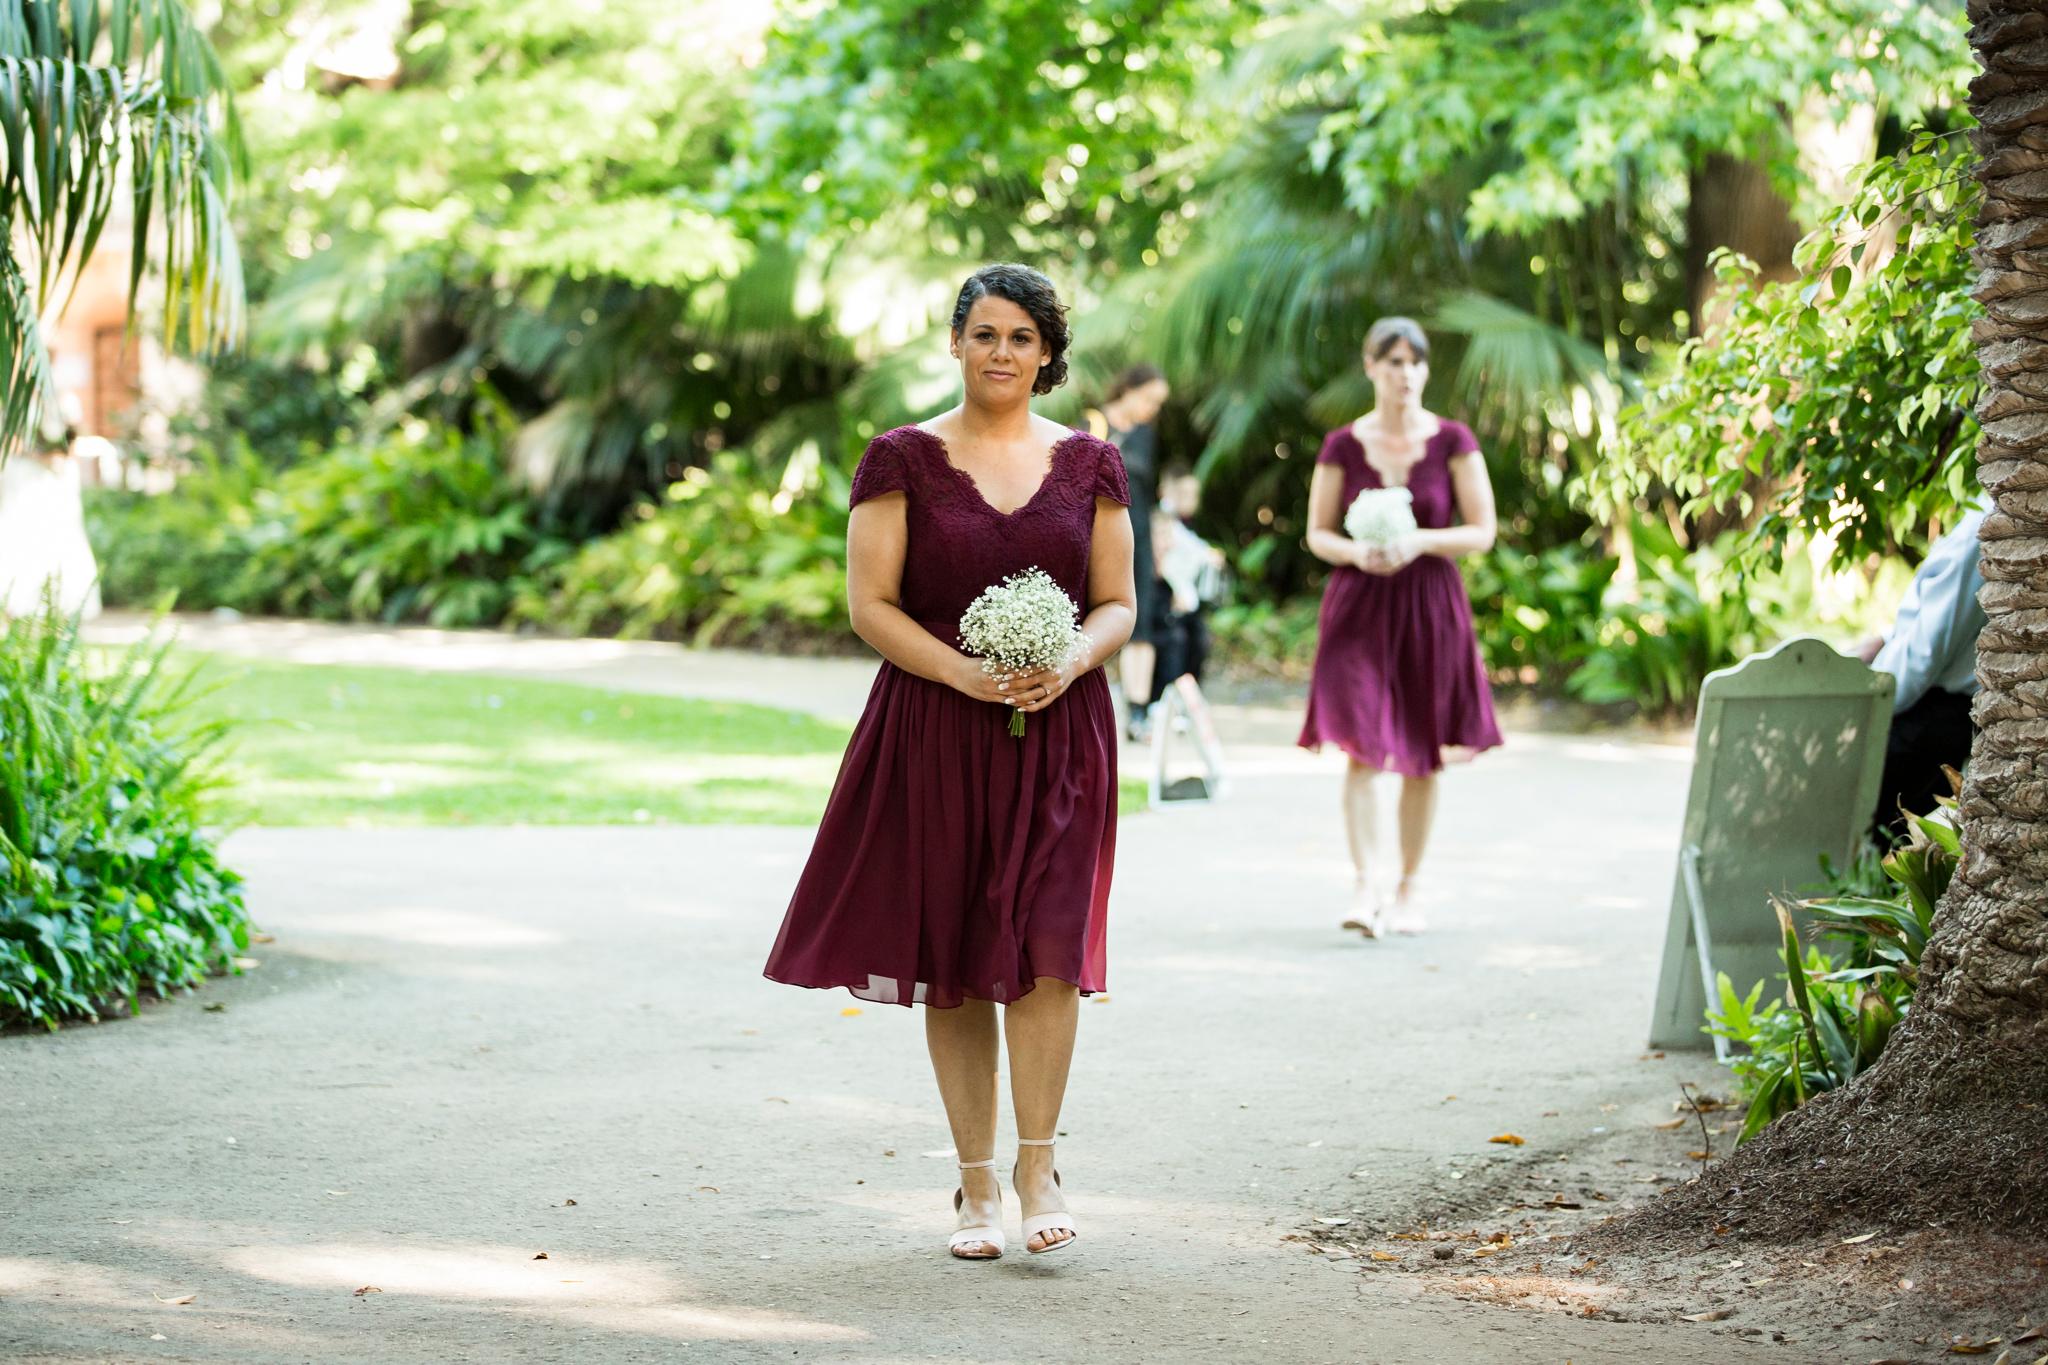 Kyme-steve-wedding-30.jpg